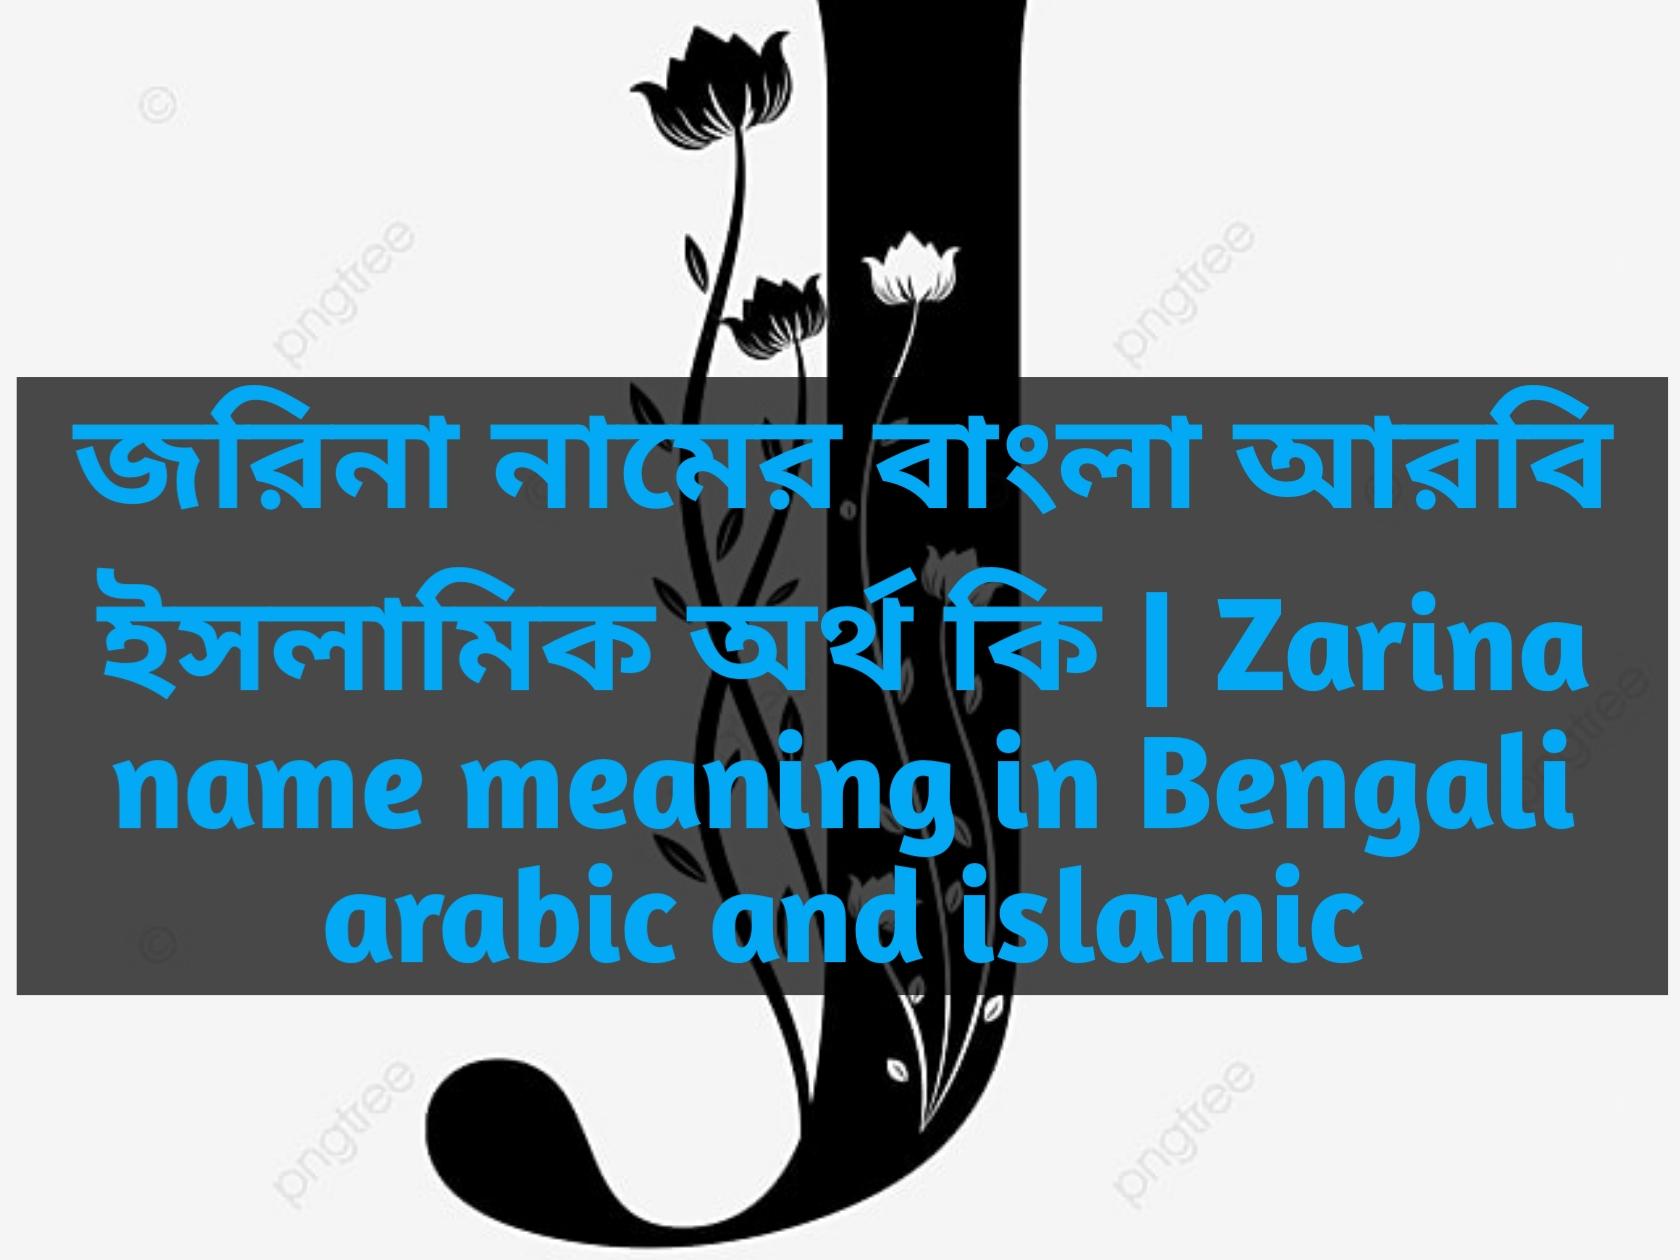 Zorina name meaning in Bengali, জরিনা নামের অর্থ কি, জরিনা নামের বাংলা অর্থ কি, জরিনা নামের ইসলামিক অর্থ কি,